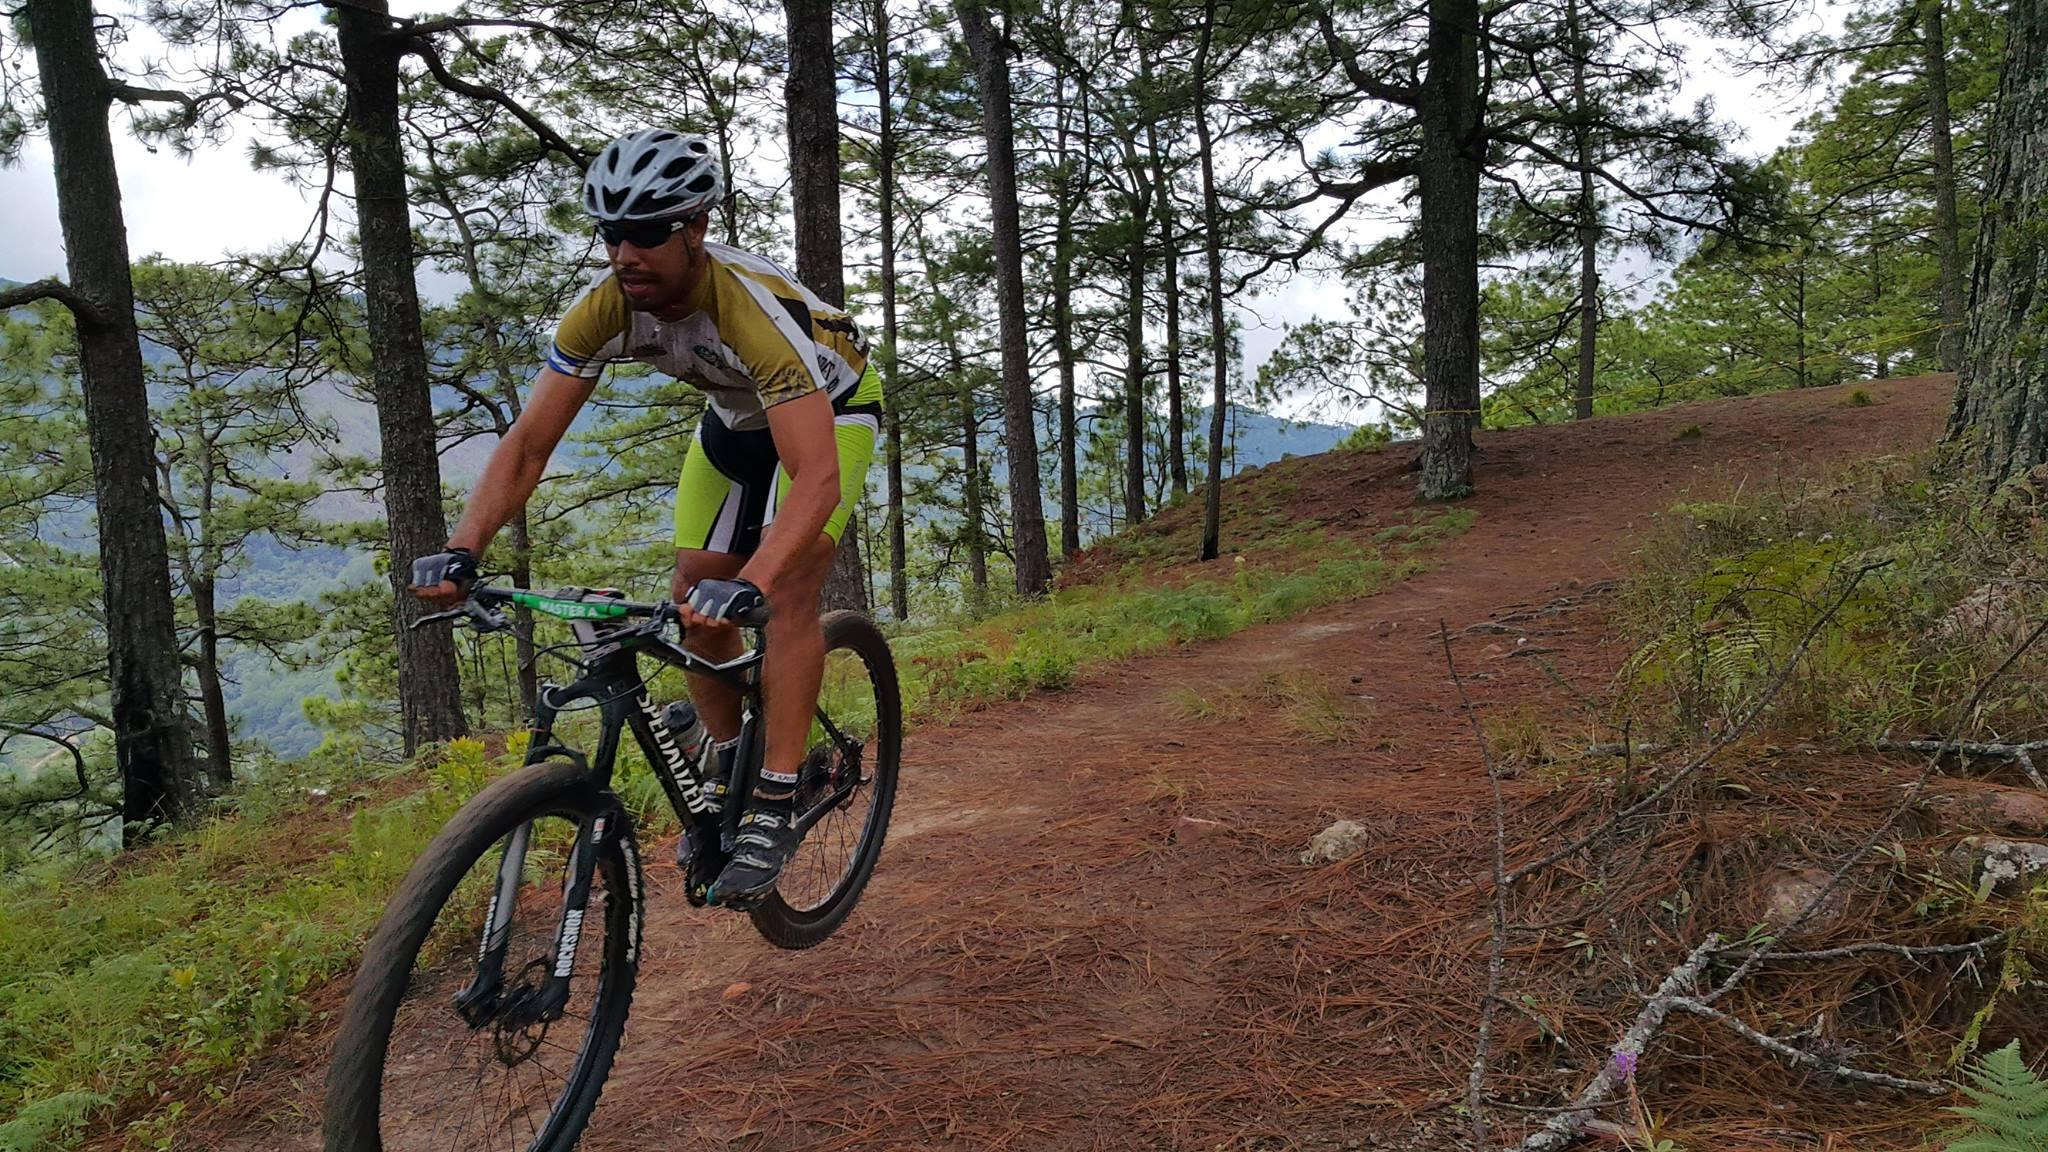 jorge-on-mountain-bike.jpg